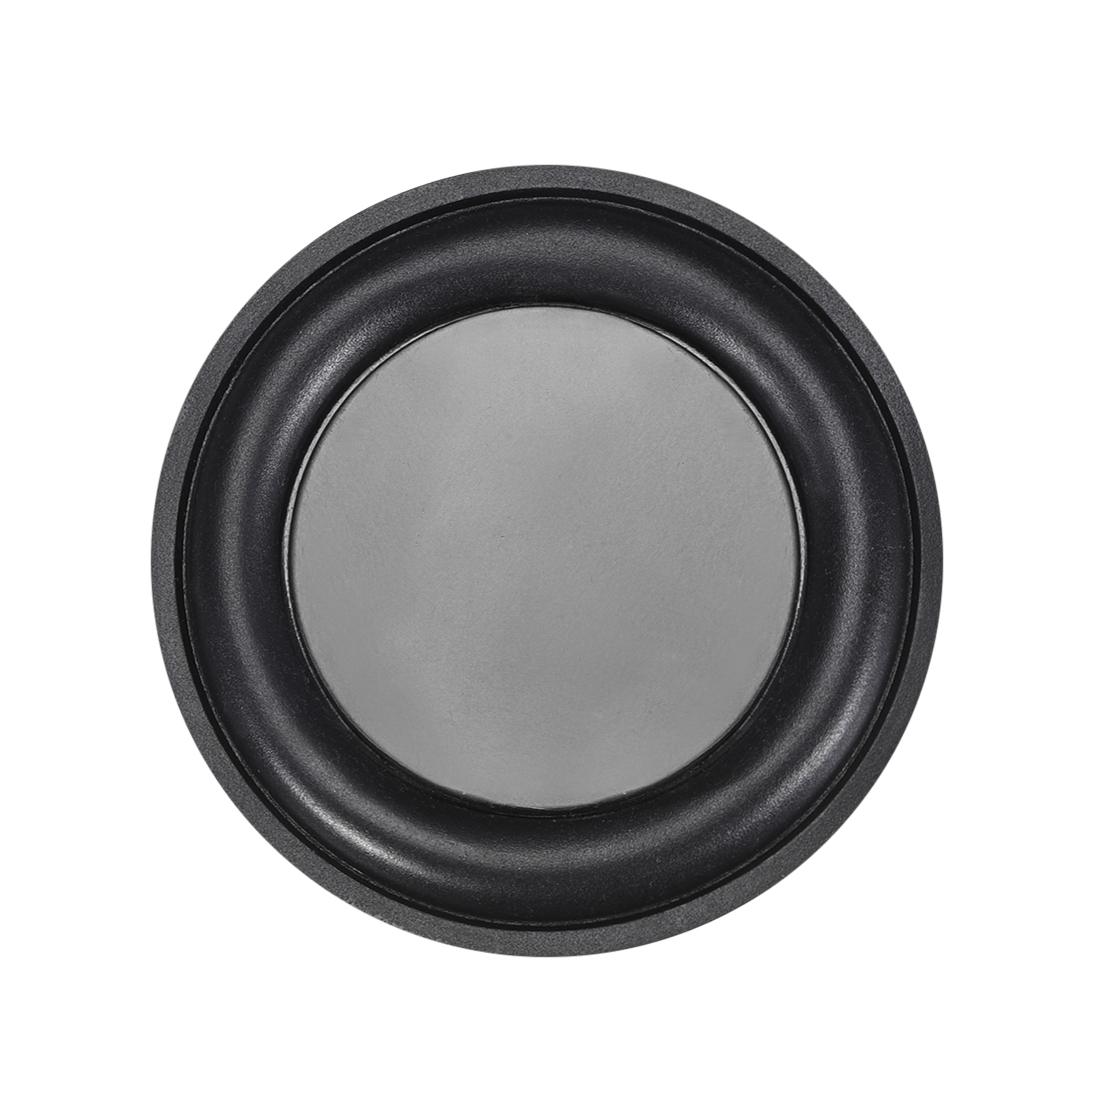 "2.5"" 62mm Bass Speaker Passive Radiator Rubber Vibration Plate DIY Repair"